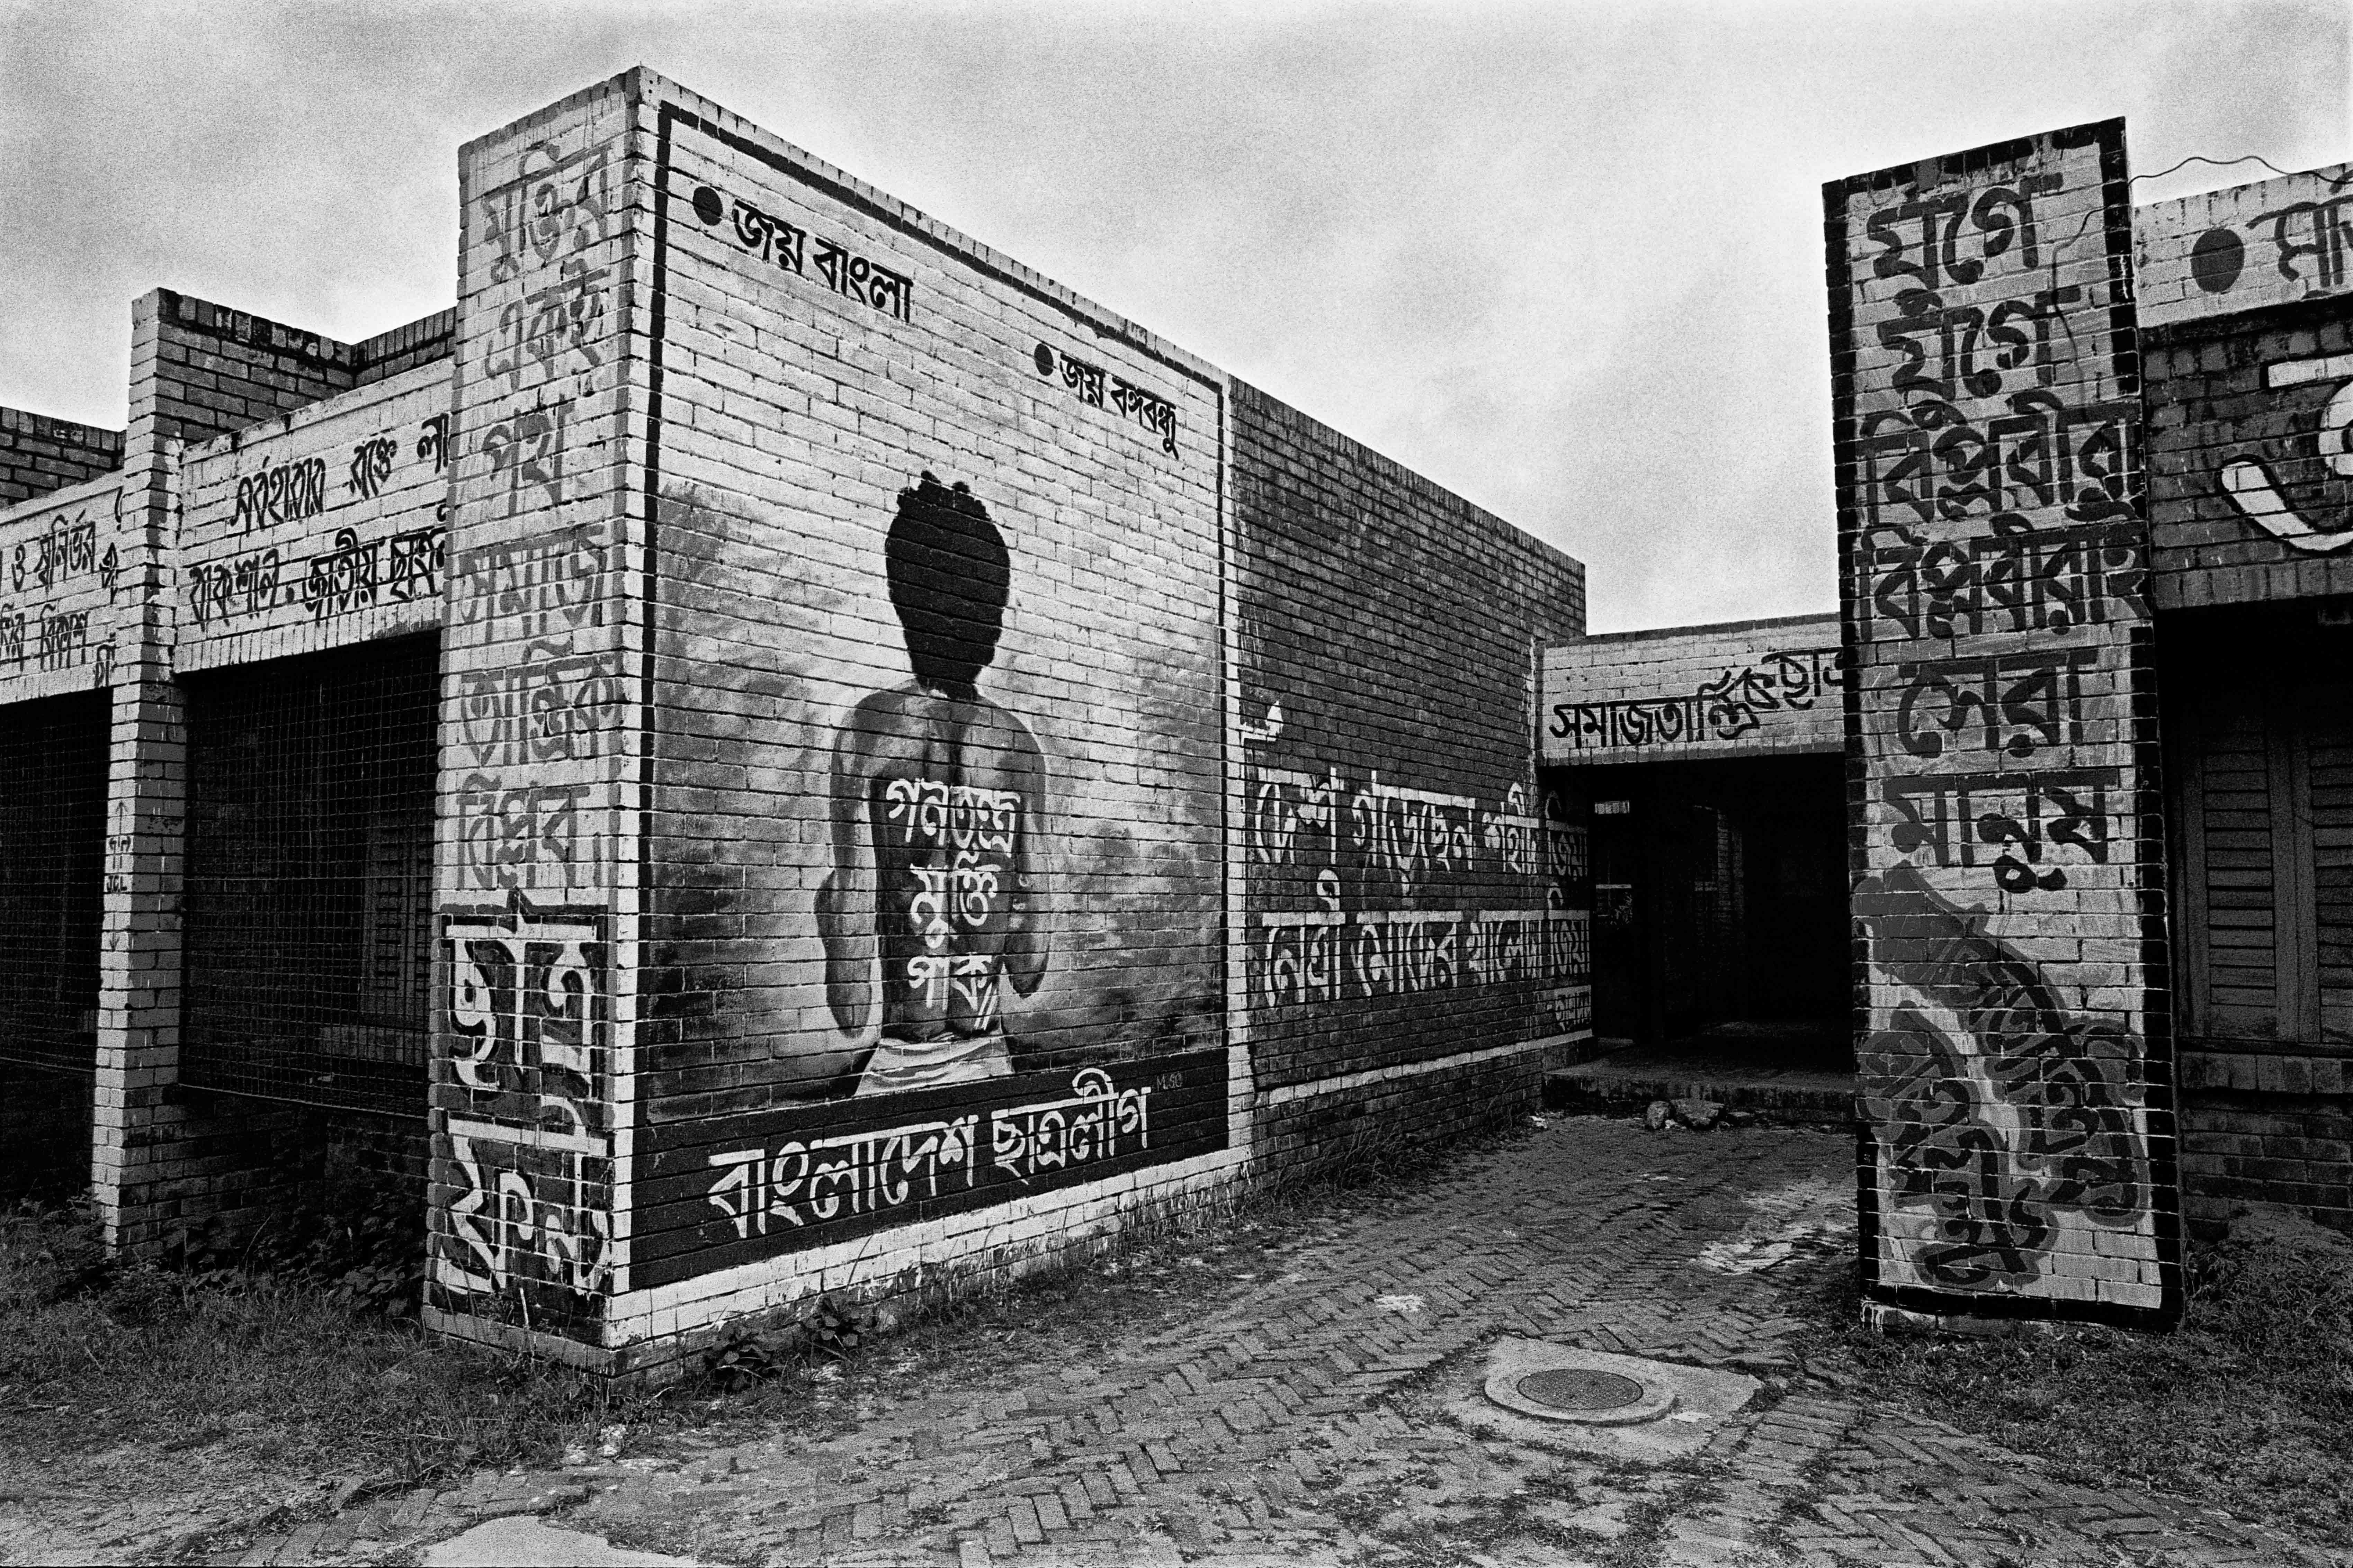 Skira Noor Mural